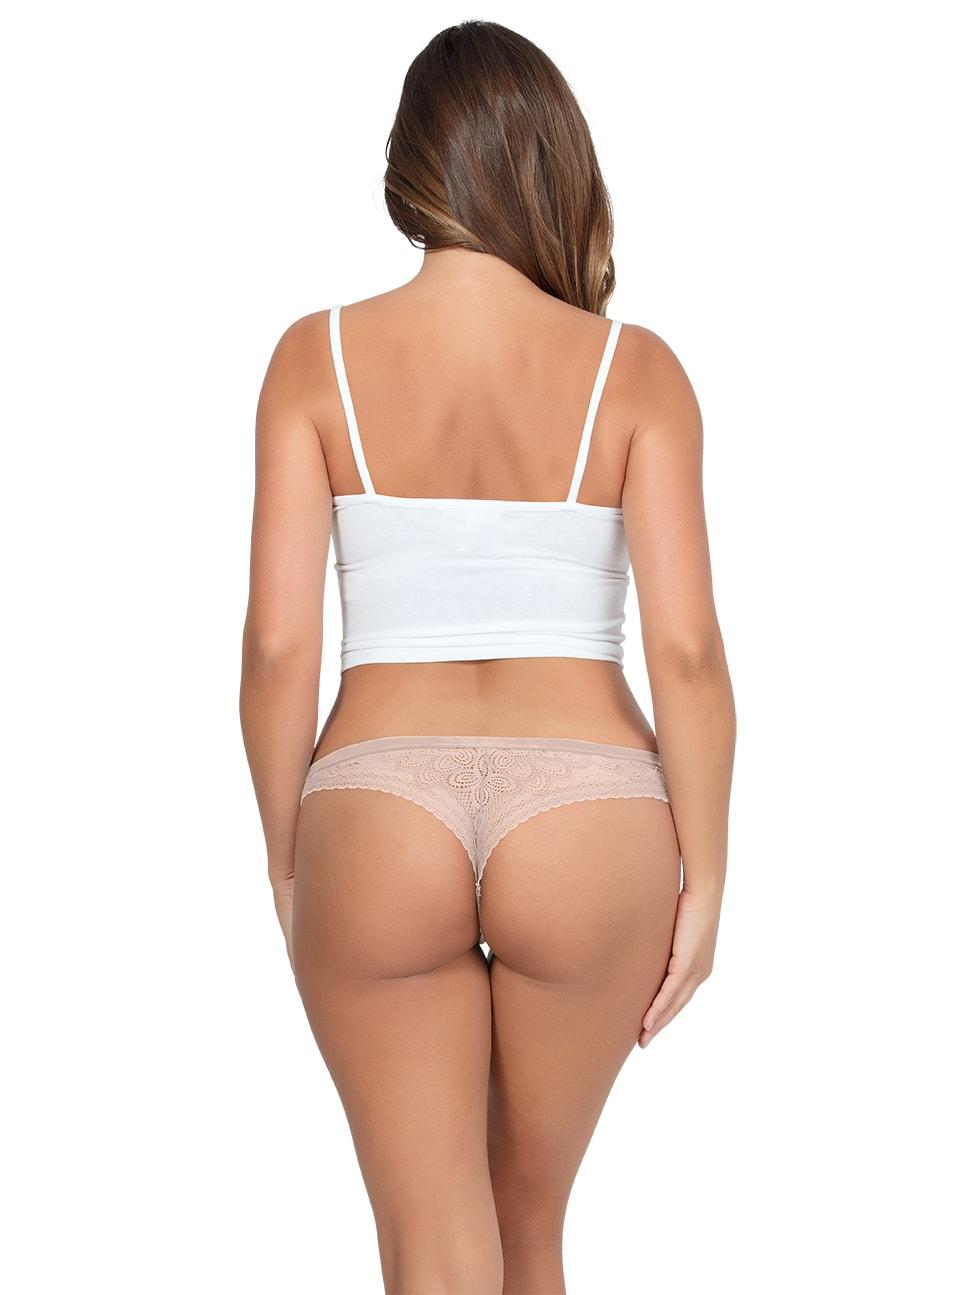 PARFAIT ParfaitPanty SoGlam ThongPP402 Bare Back copy - Parfait Panty So Glam Thong - Bare - PP402